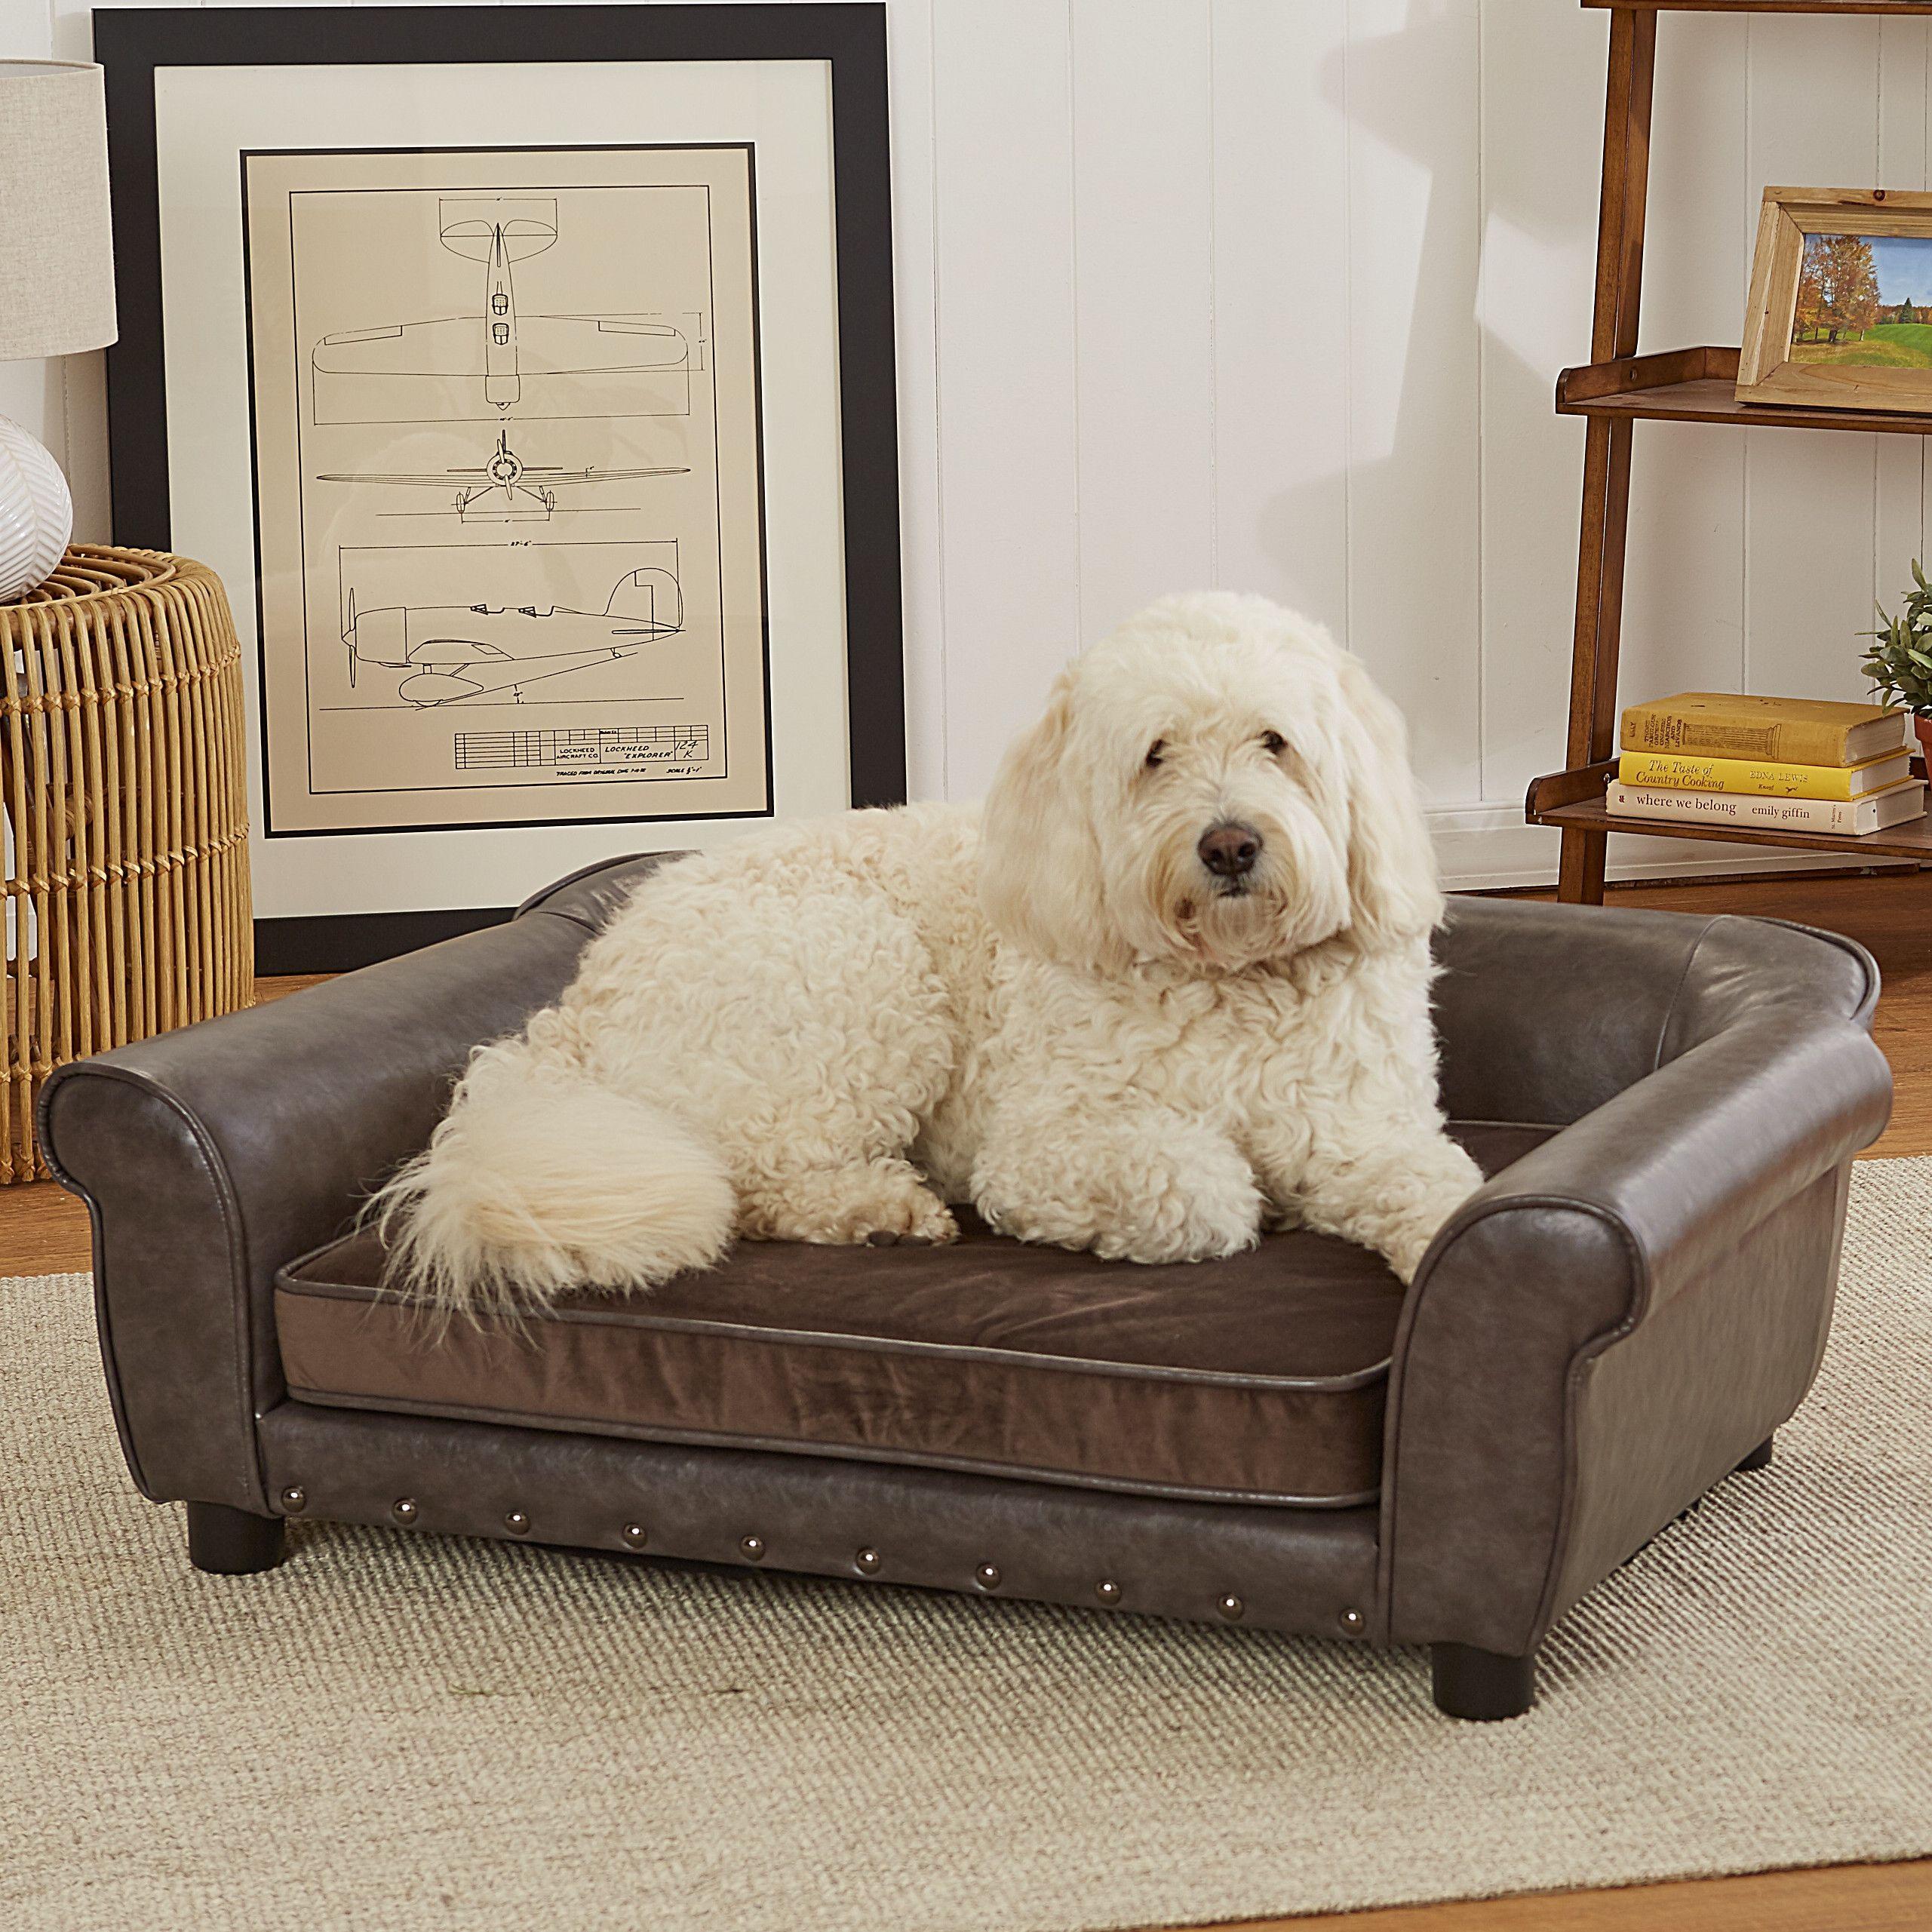 Enchanted Home Pet Spencer Dog Sofa Pet sofa, Pet sofa